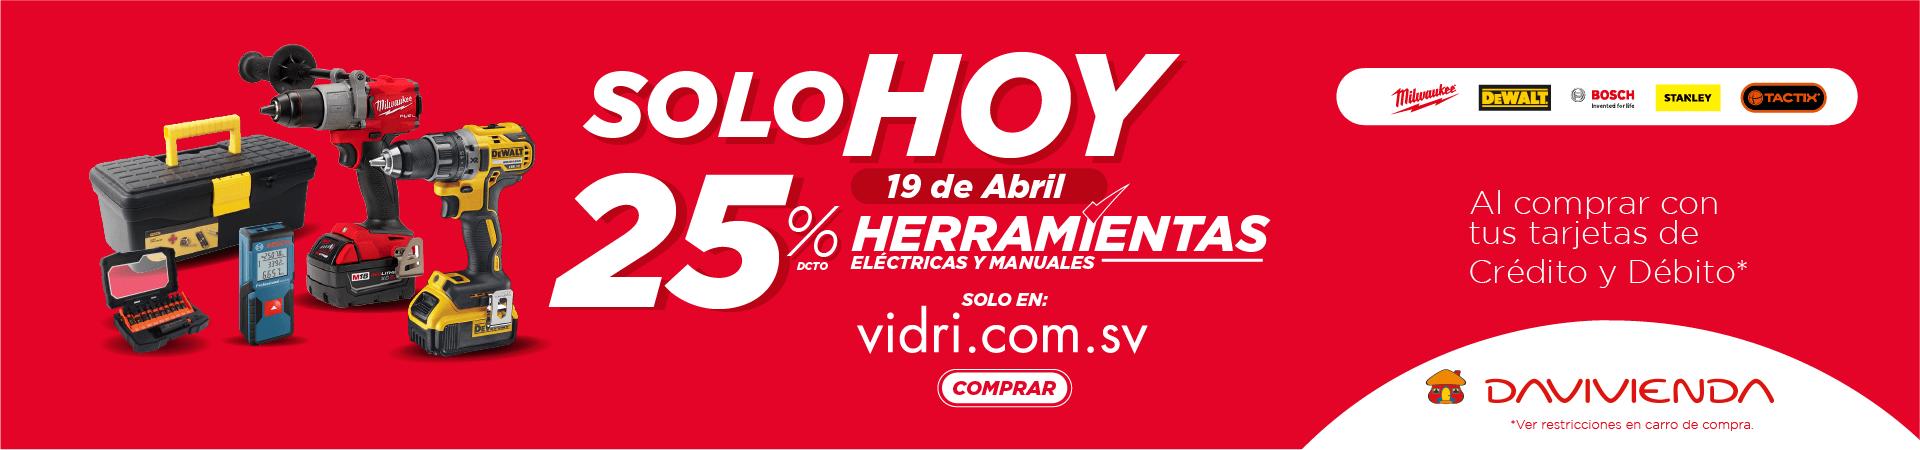 Banner_Promo_Davivienda_Herramientas-19Abril